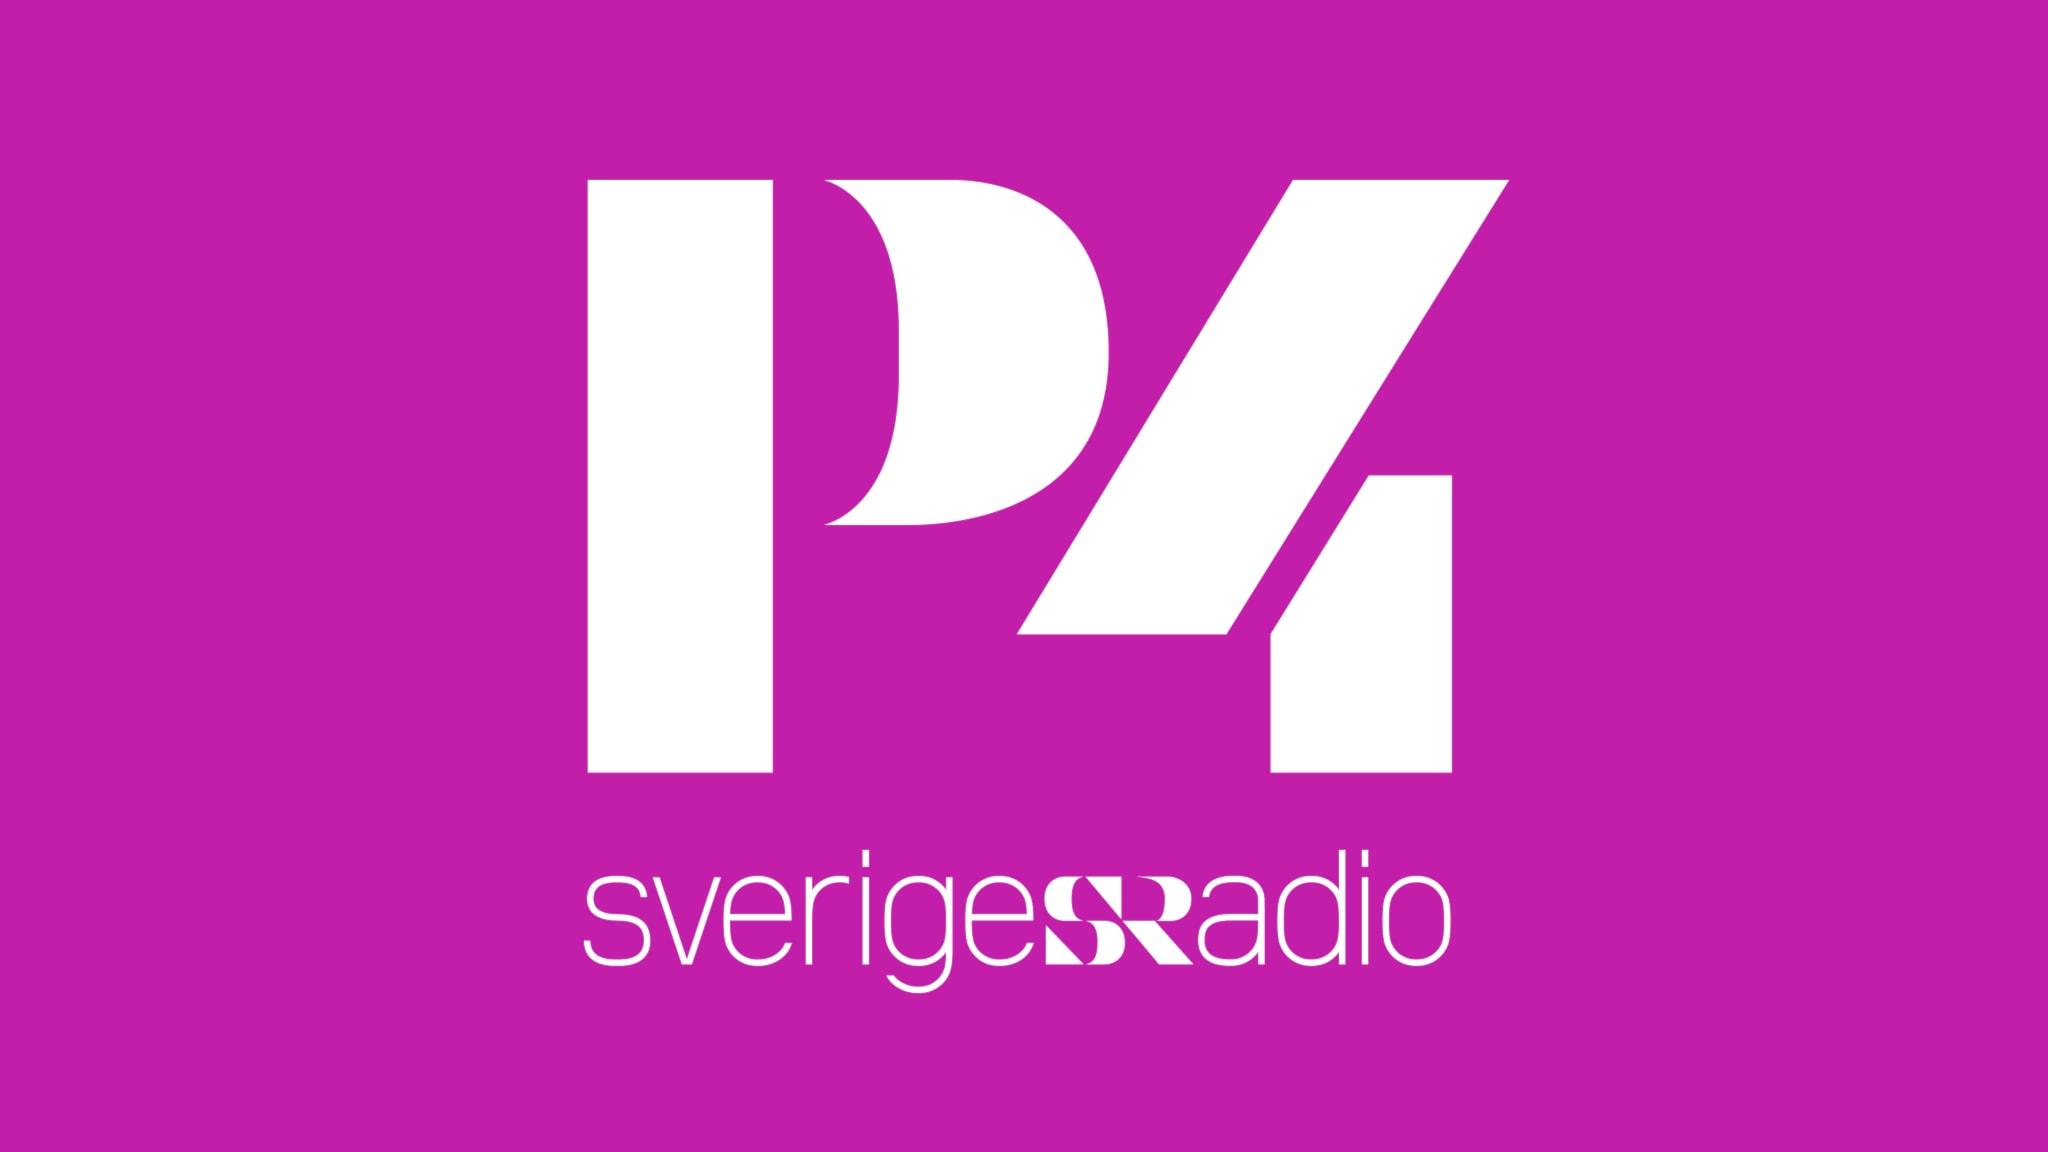 Trafik P4 Göteborg 20180111 07.35 (00.27) - spela